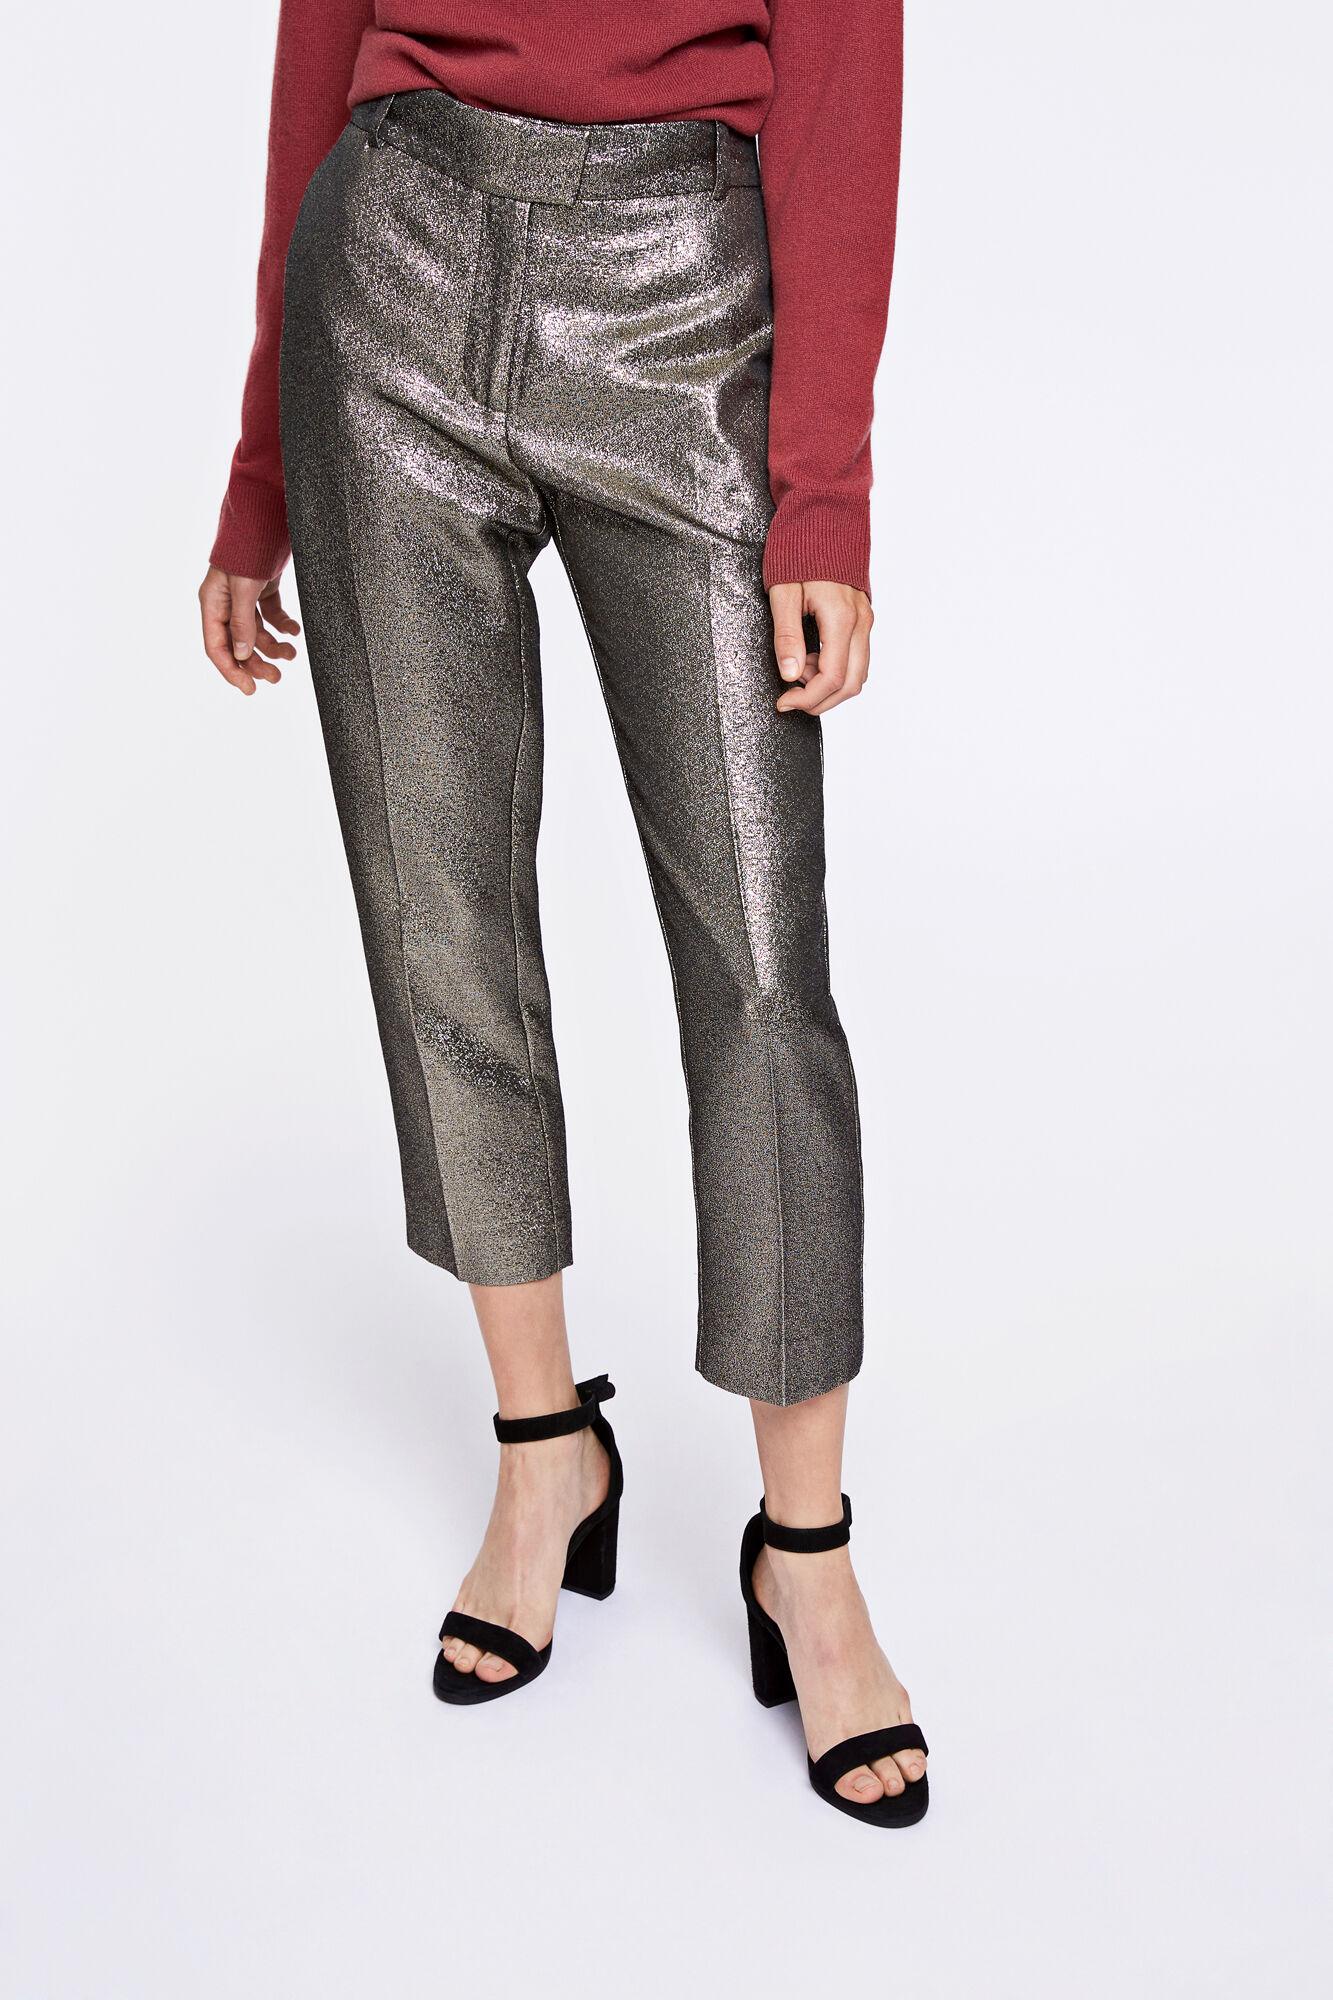 Lola pants 8302, GOLD SILVER